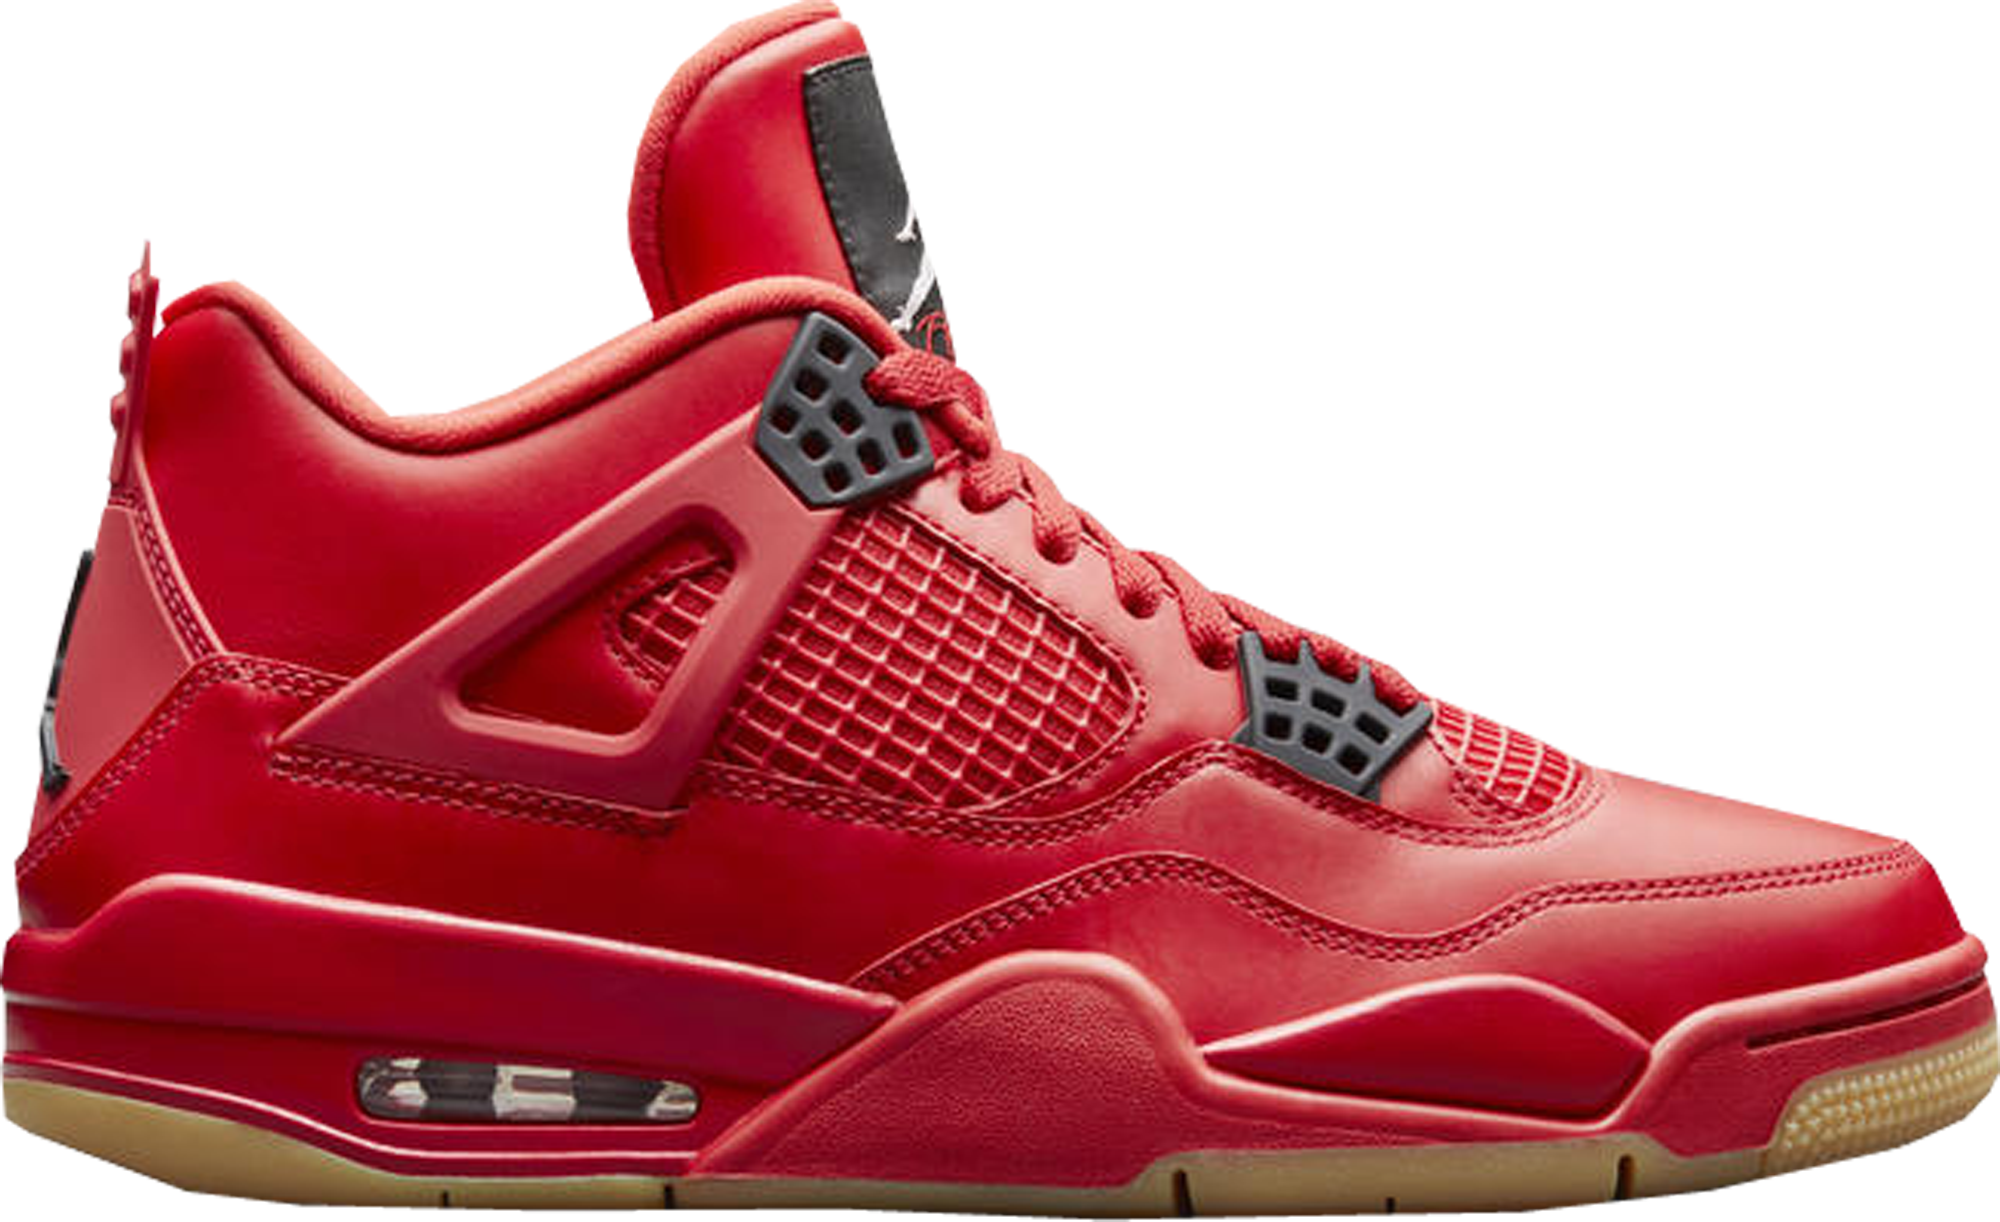 98b306679d892 ... where can i buy buy air jordan 4 shoes deadstock sneakers b4b8a 4927d